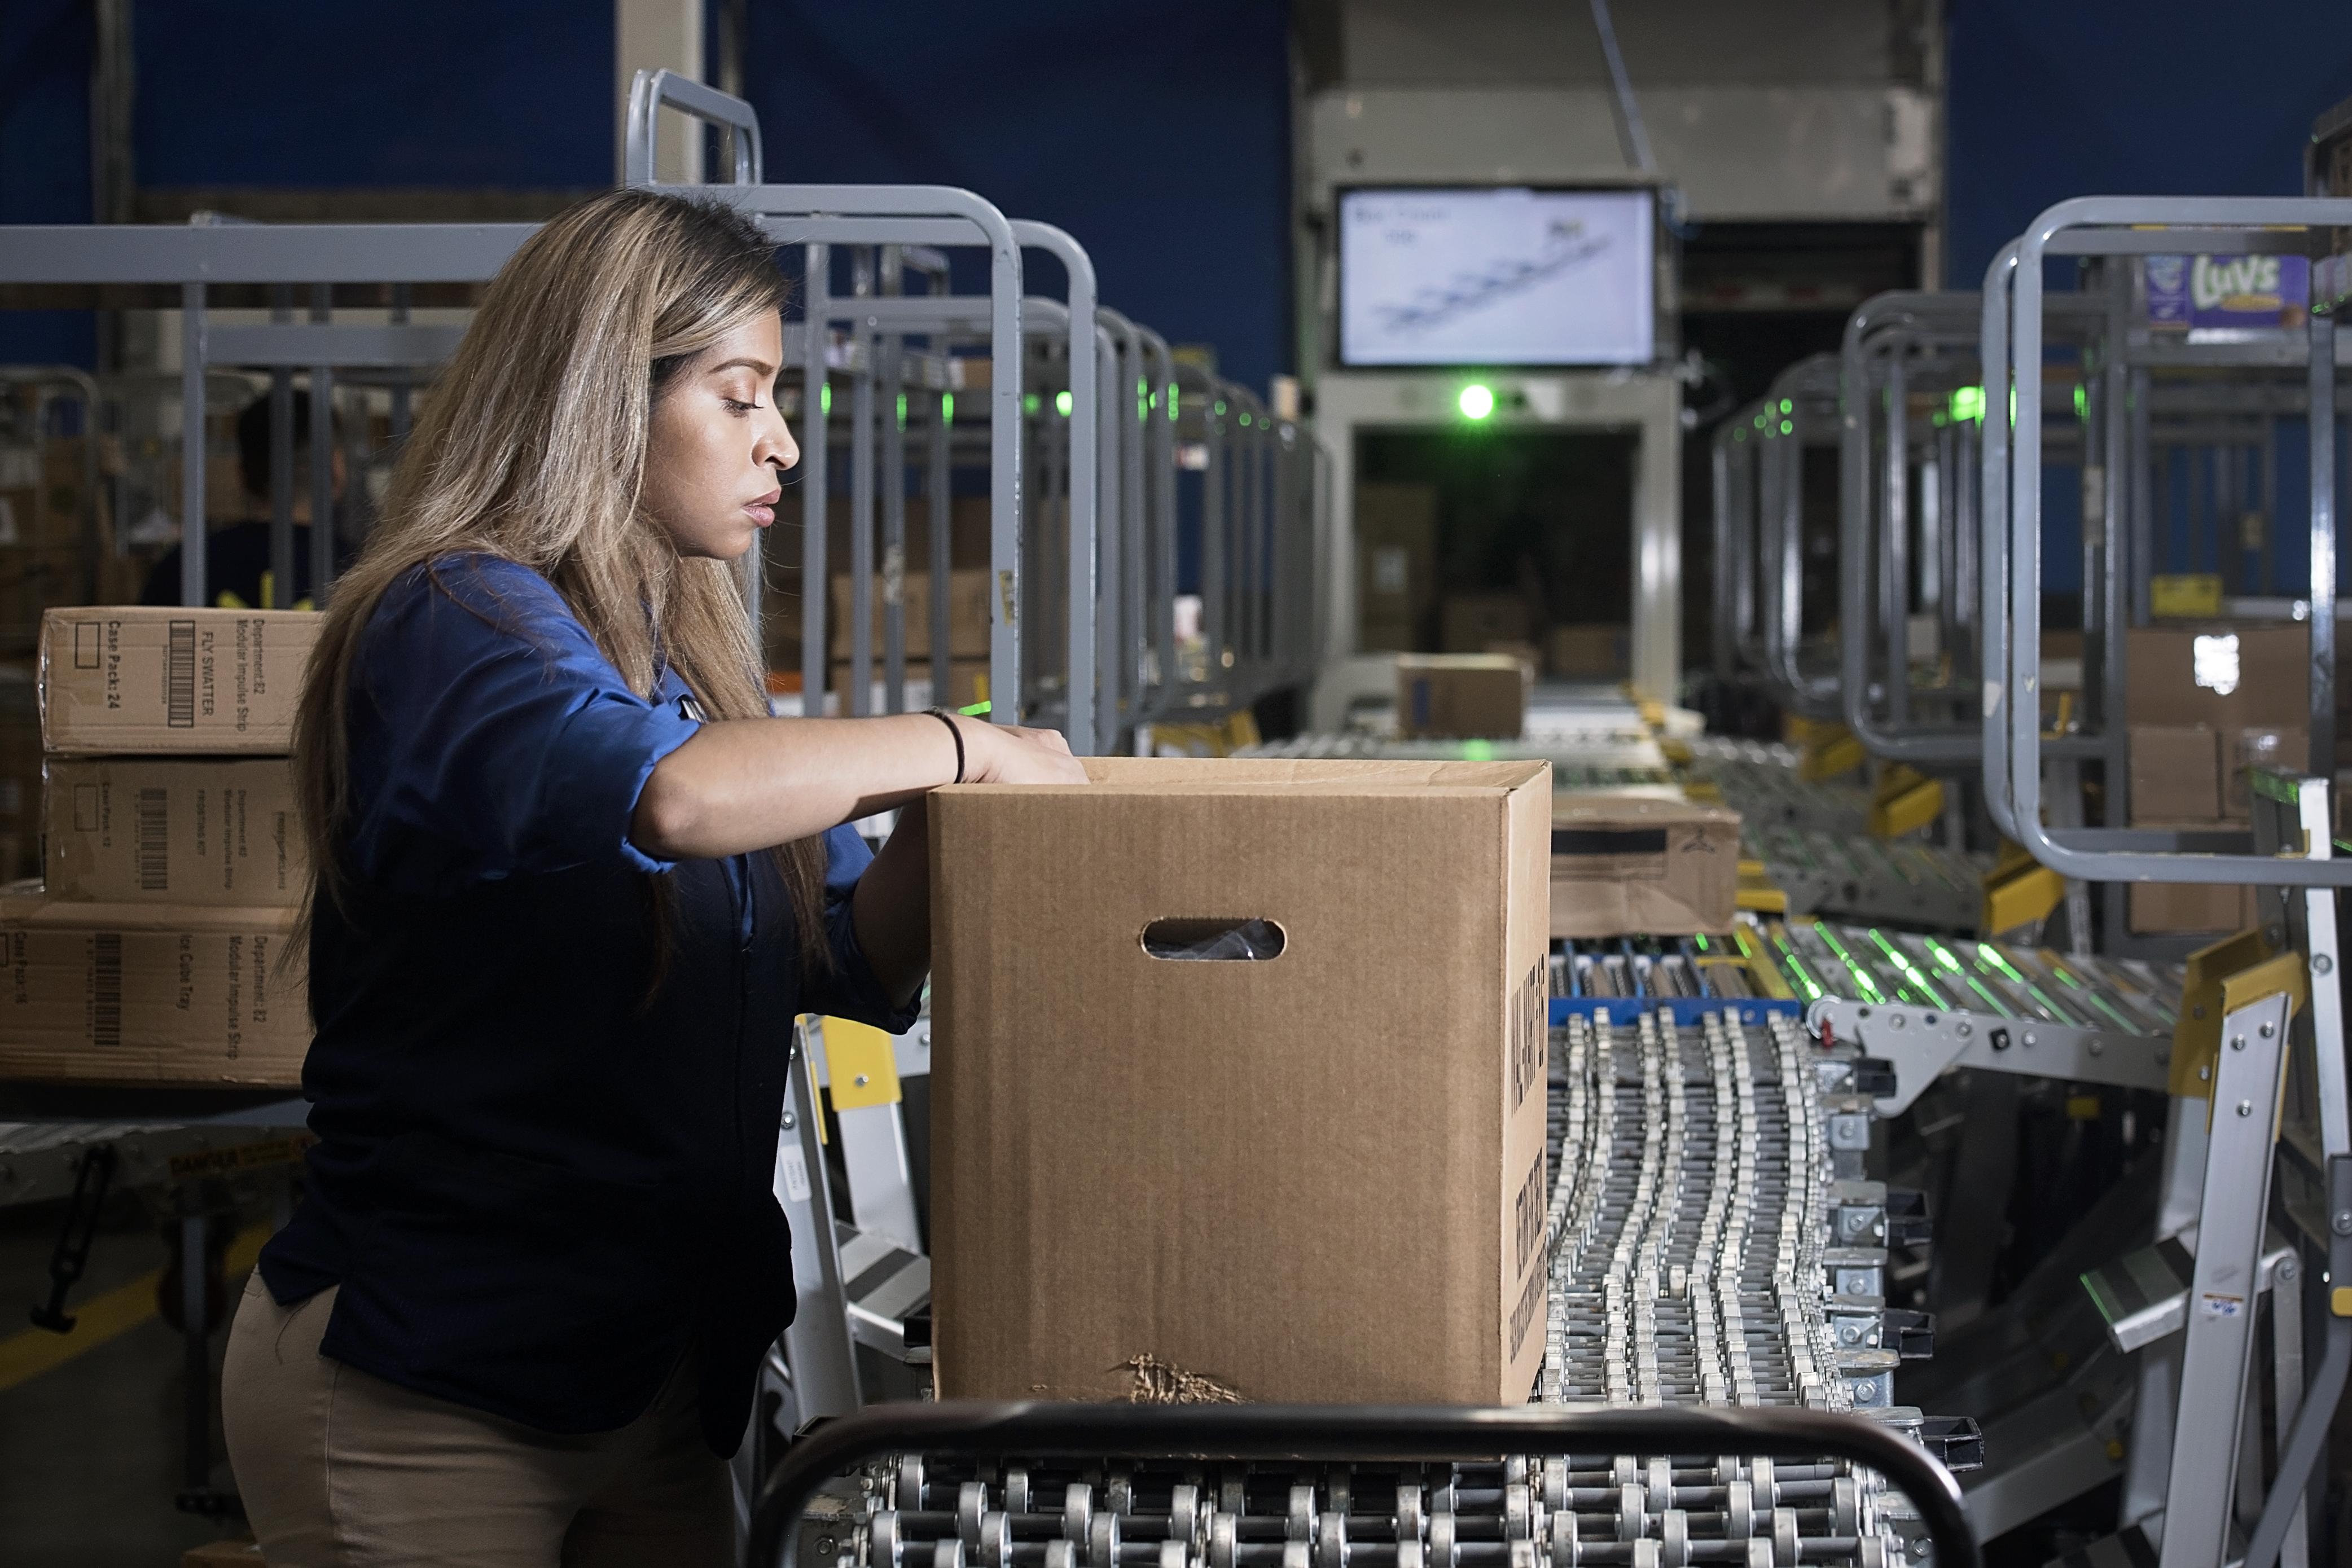 Associate unloads a box using the FAST unloading process